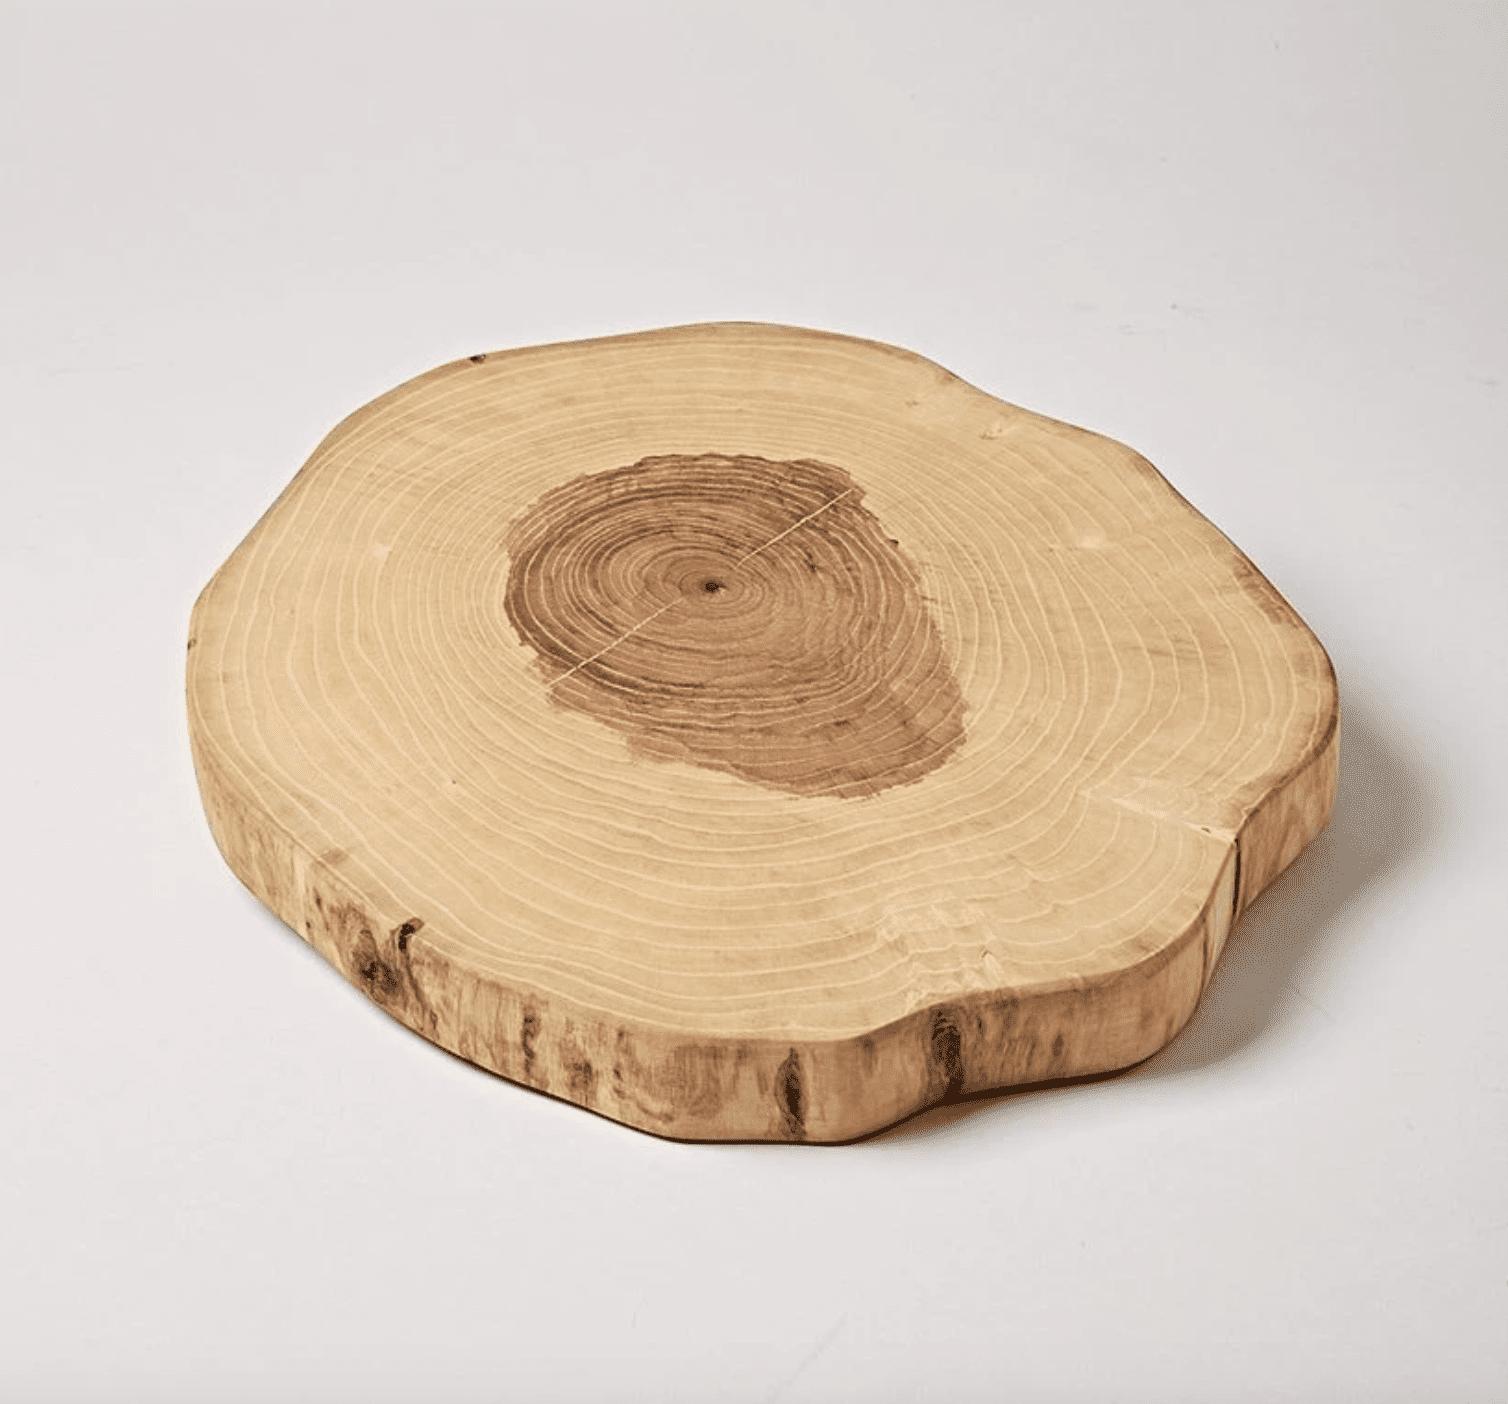 Ryland Farmhouse Pottery Wood Slice